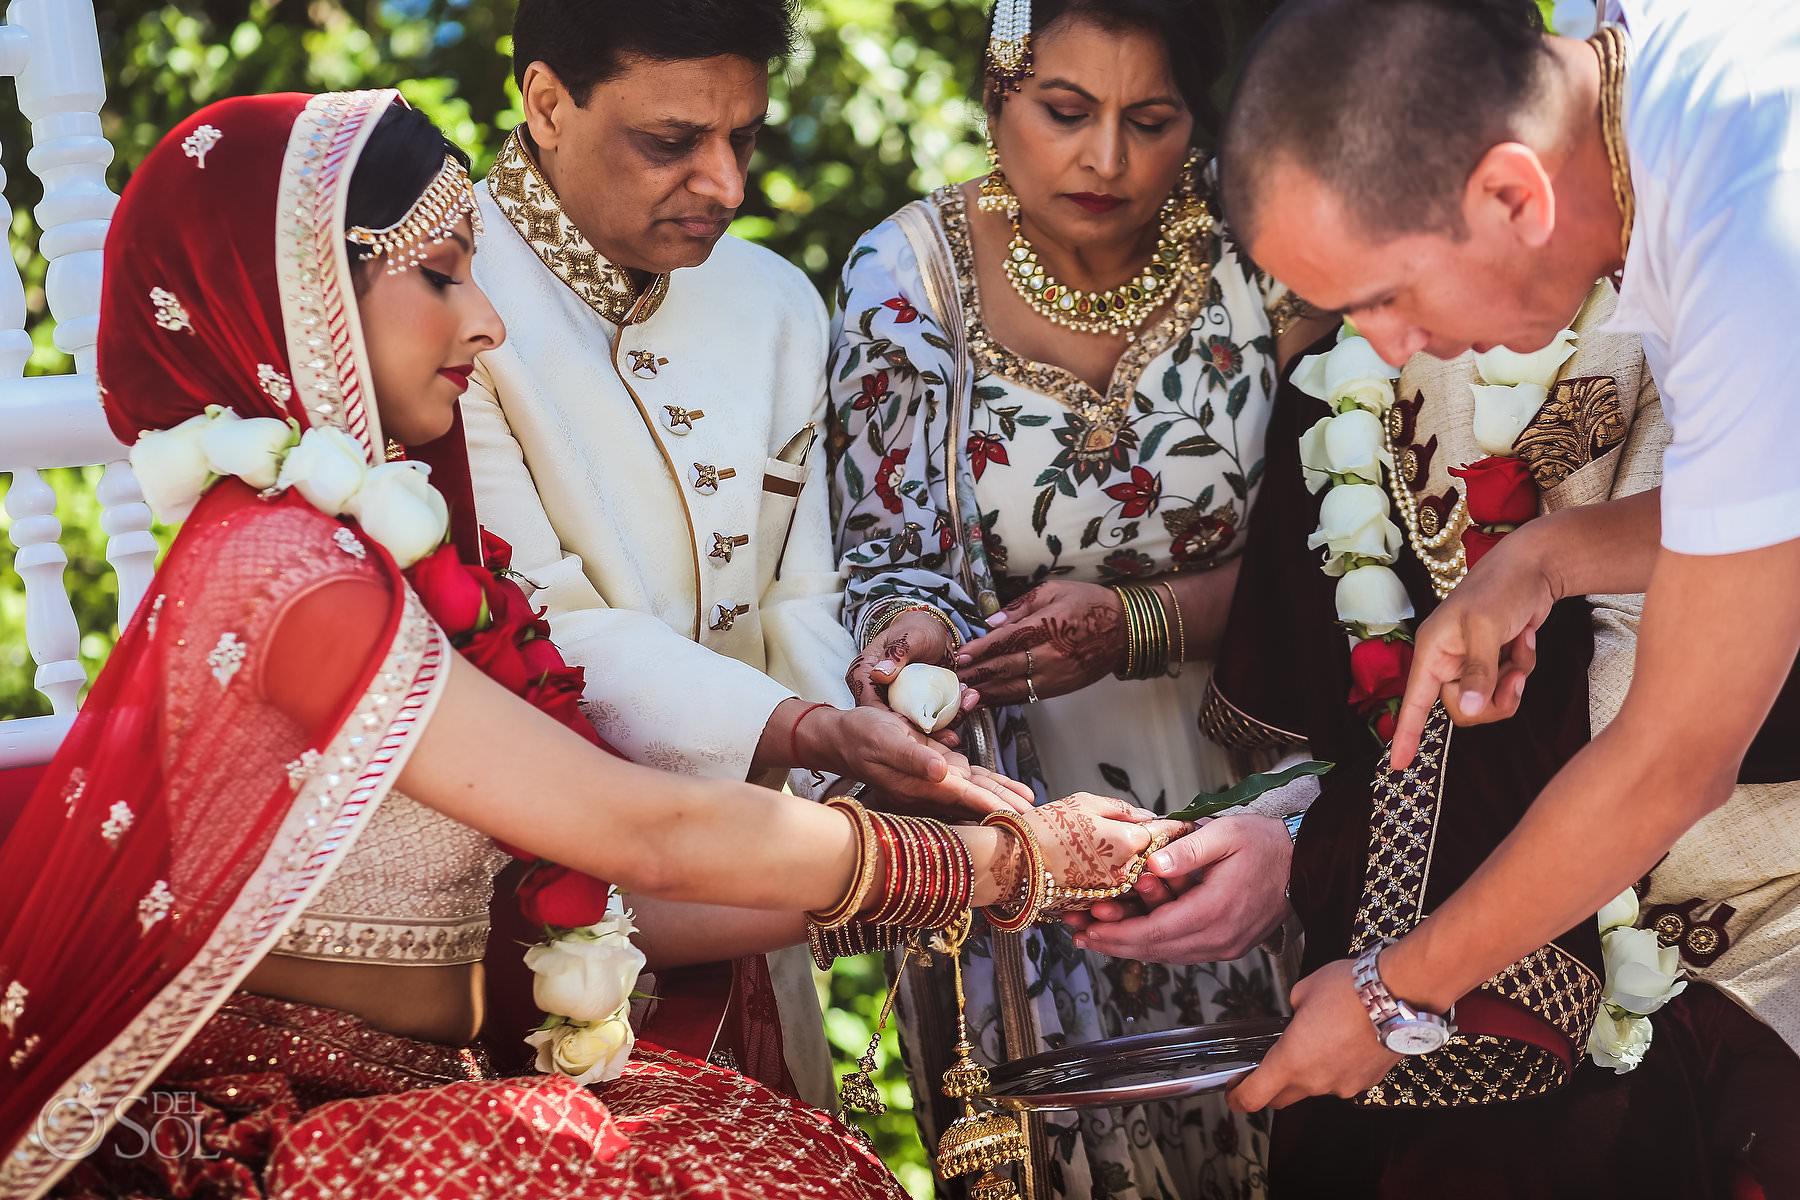 Mexico South Asian Wedding tradition Laja Homa Dreams Tulum Riviera Maya